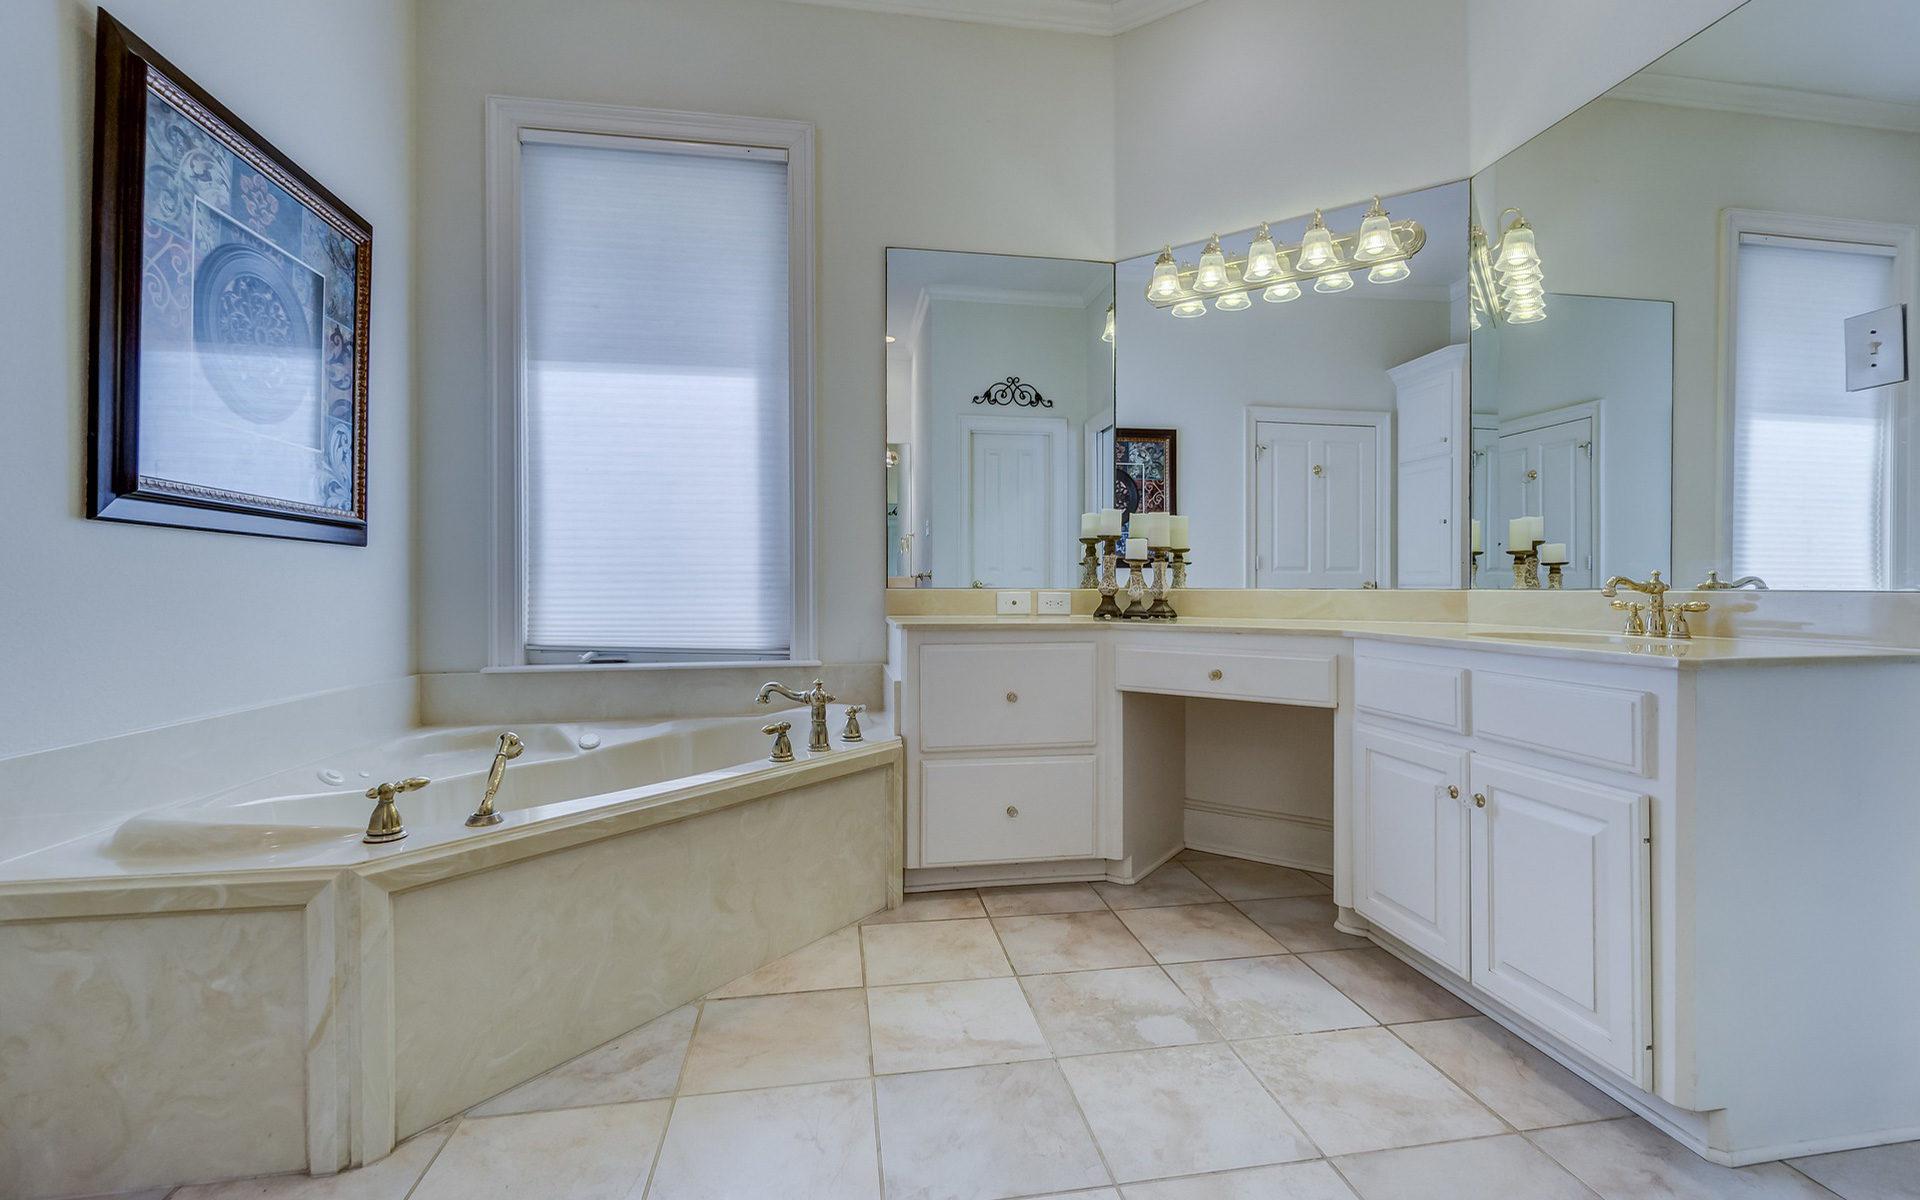 Kainz Haustechnik Badezimmer